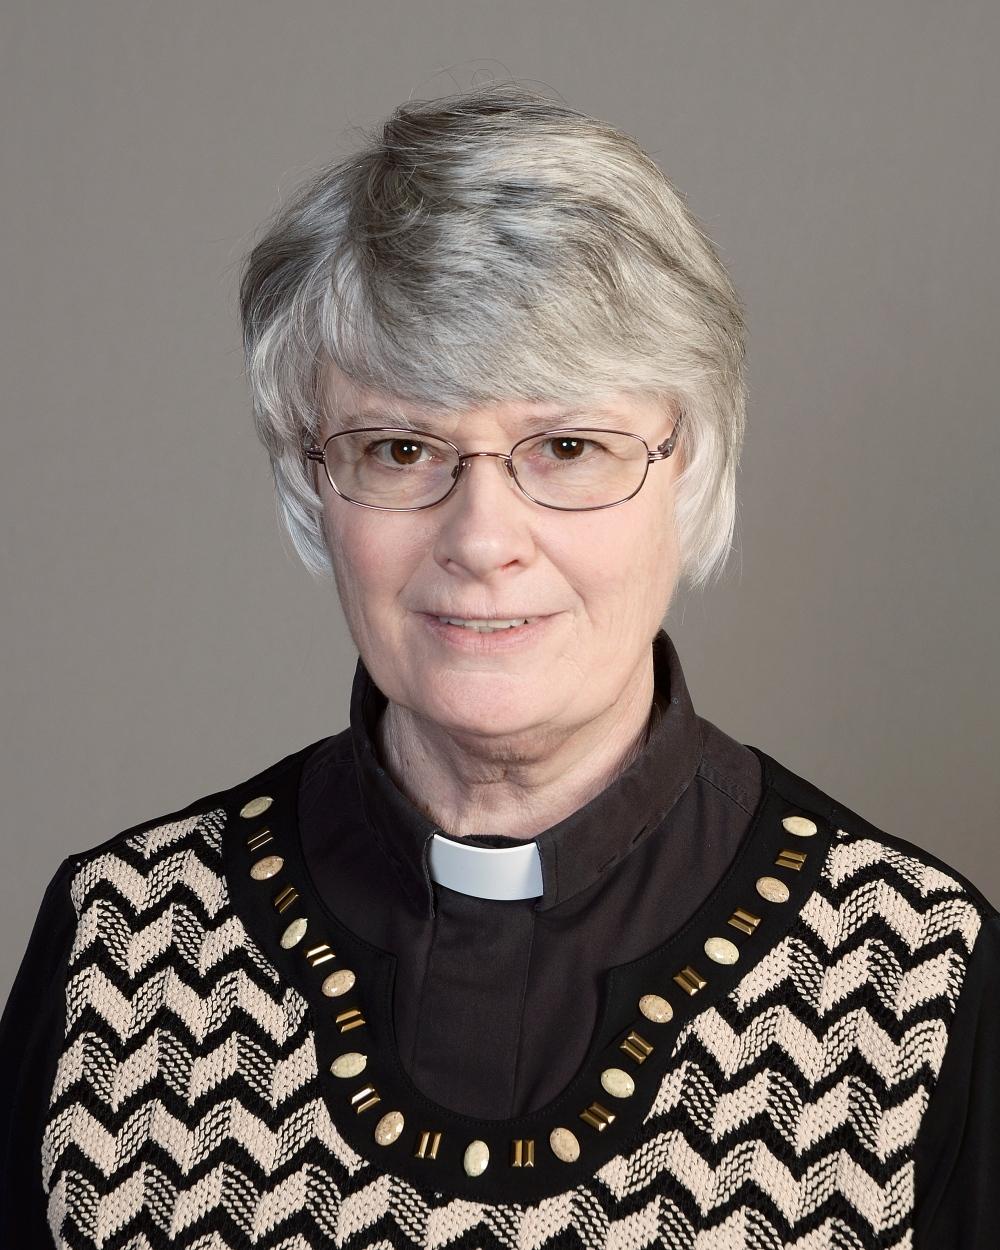 Secretary The Rev. Pam Mitcham St. John, Springfield - West Central